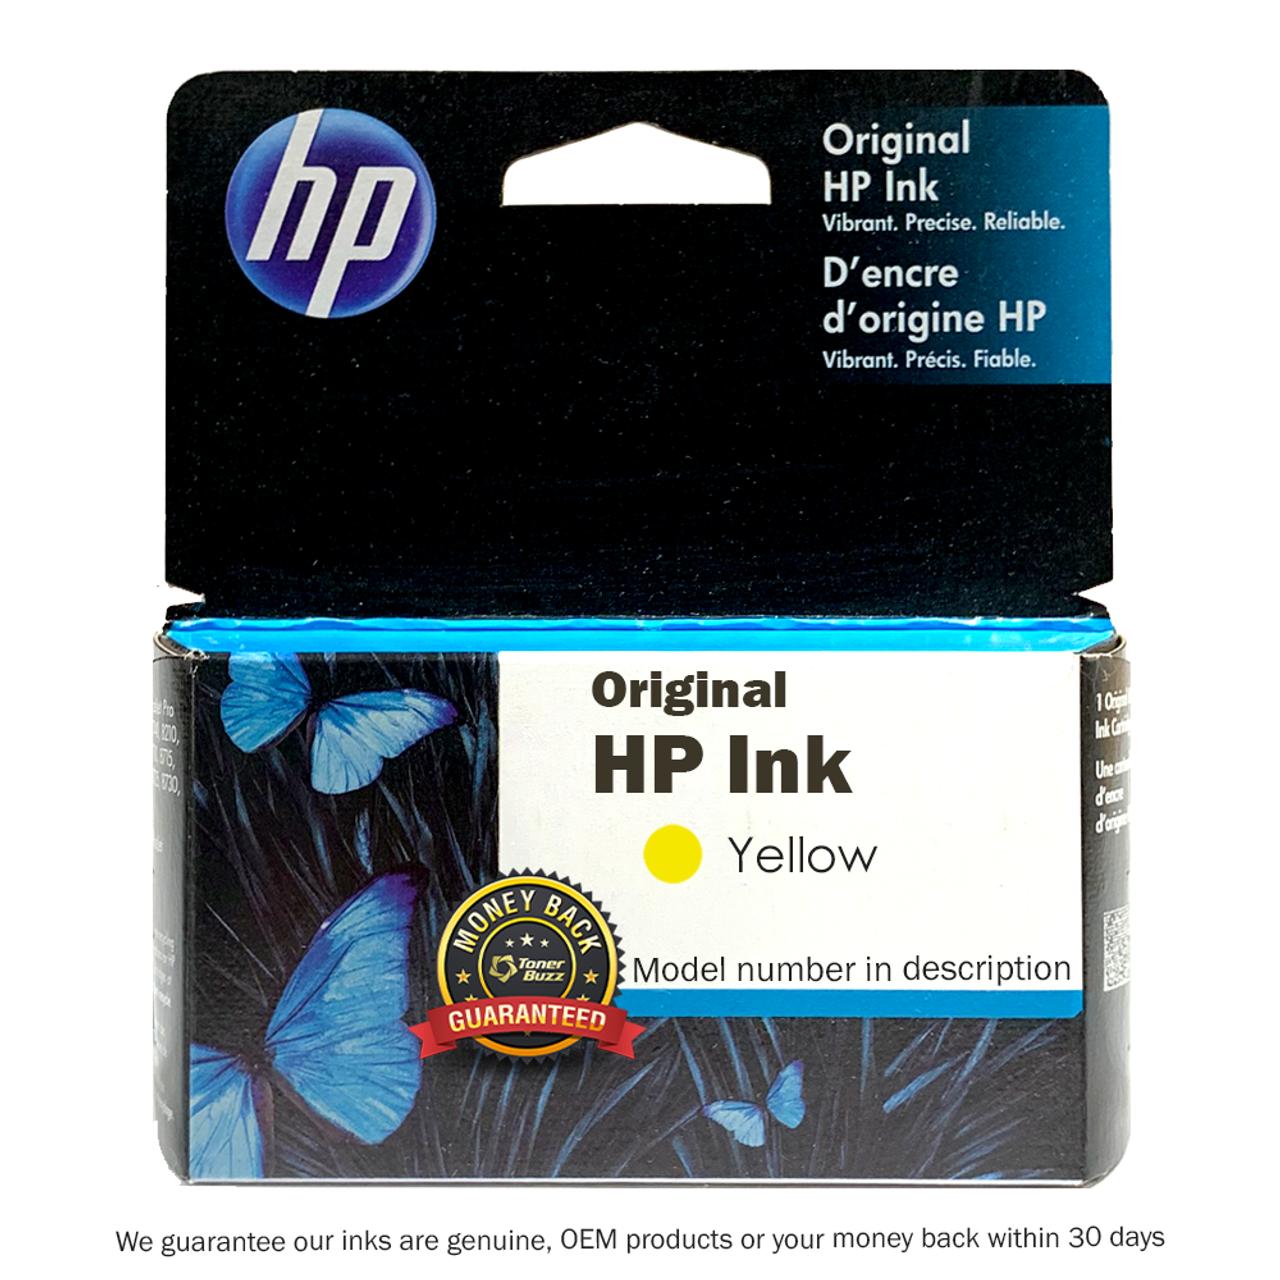 New Yellow Genuine HP Ink Cartridge 82 C4913A